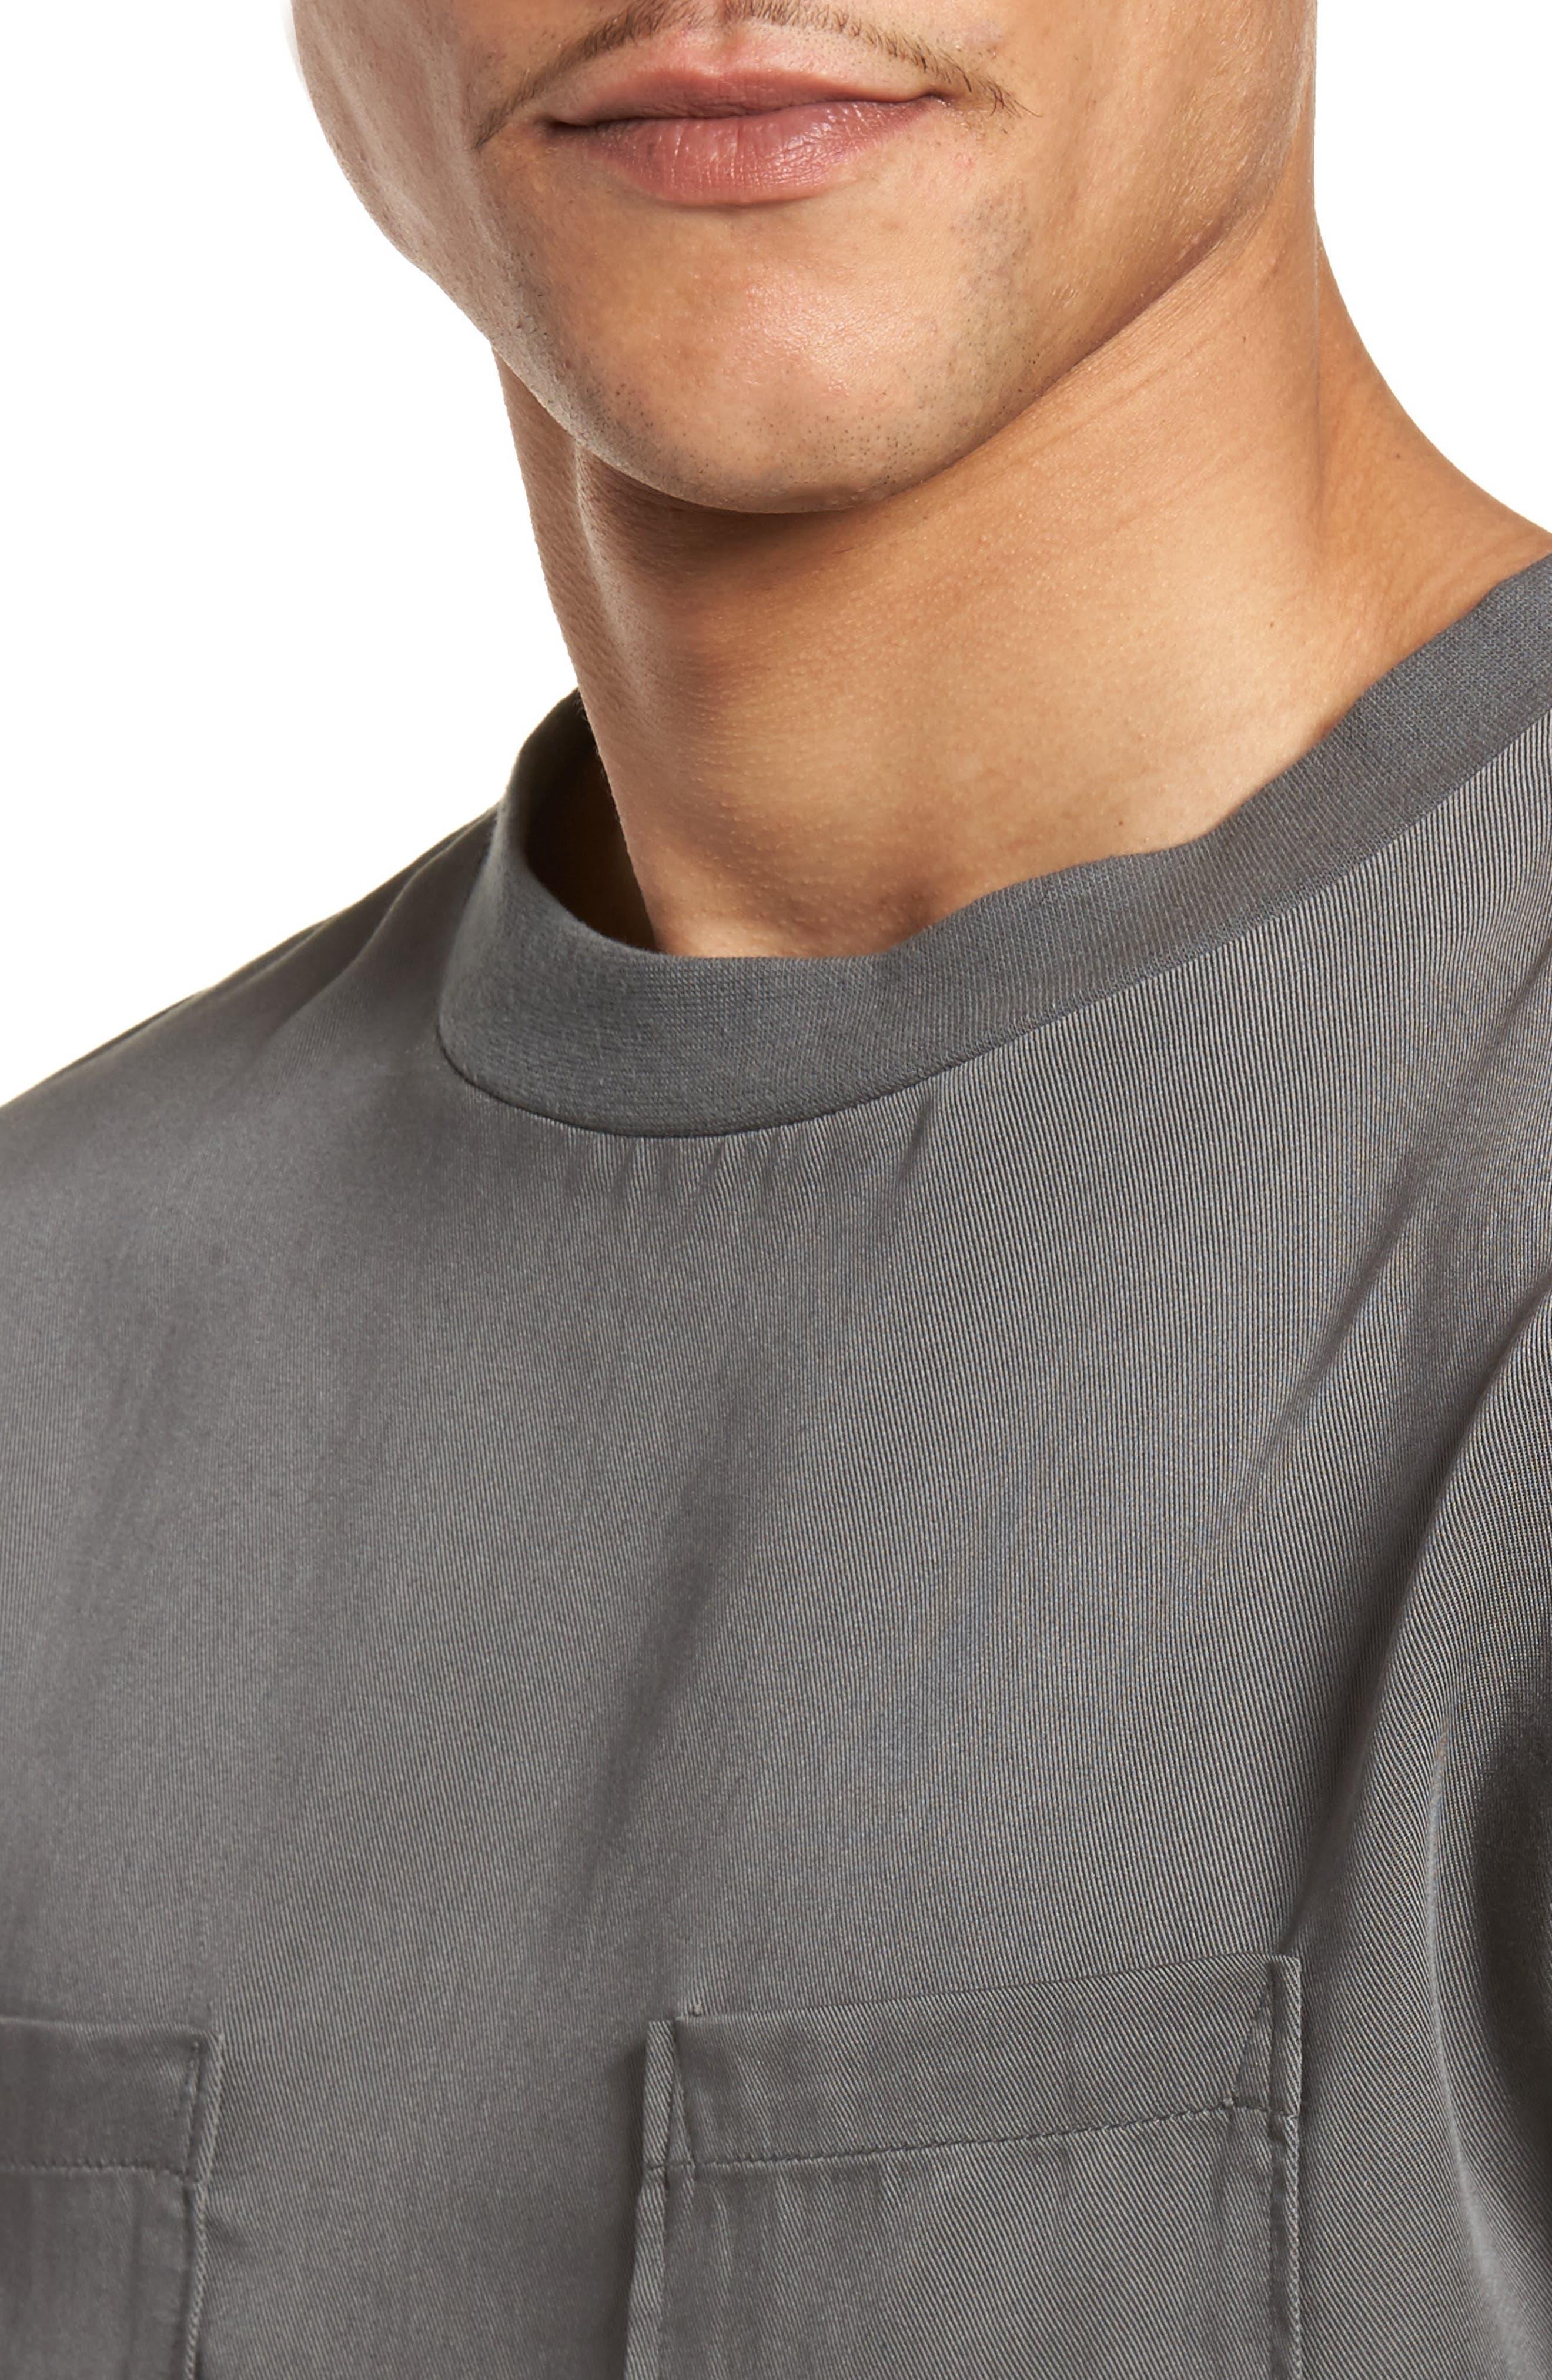 Denali Woven T-Shirt,                             Alternate thumbnail 4, color,                             Grey